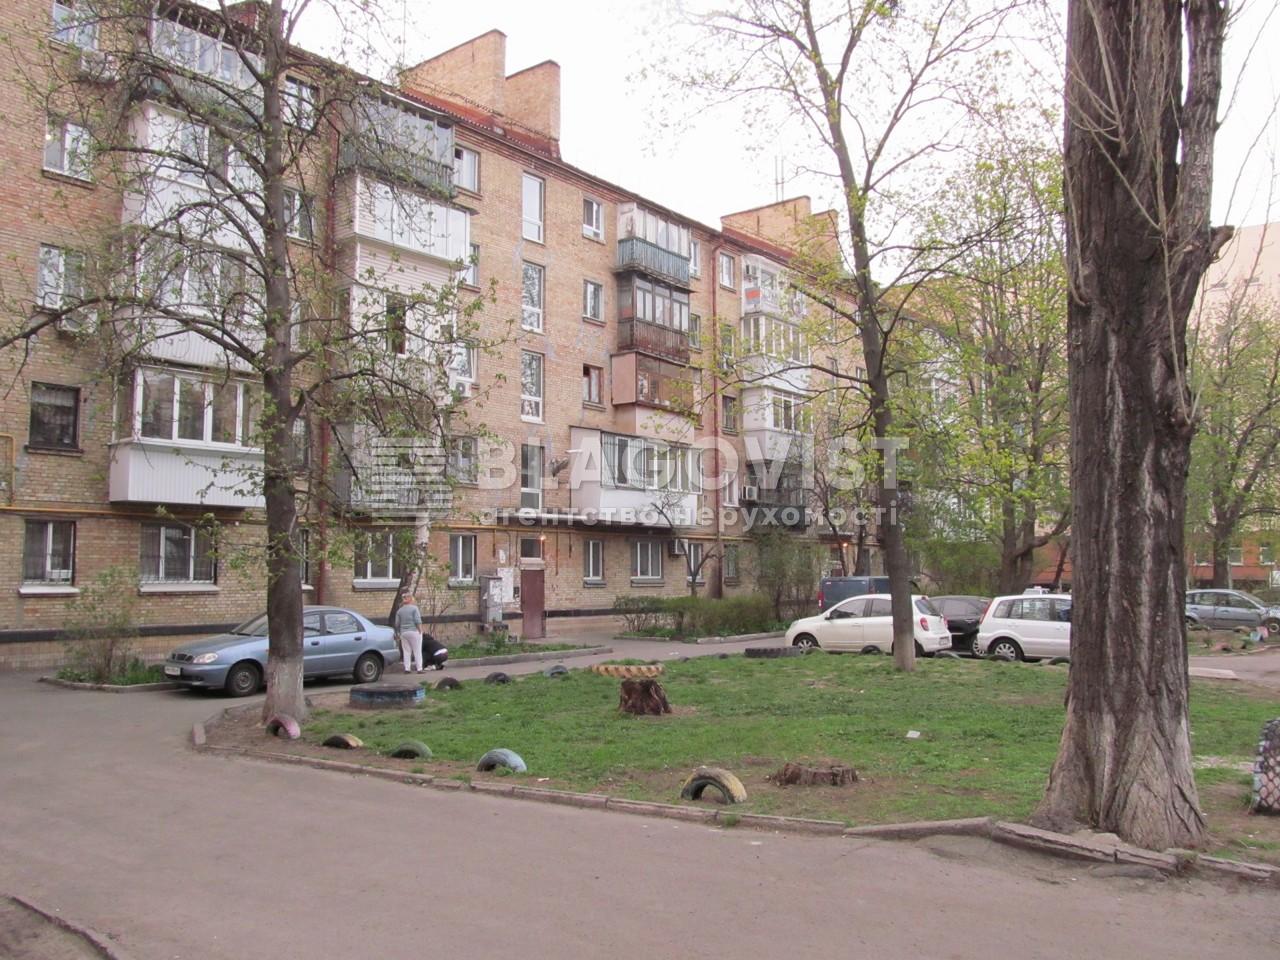 Квартира Z-329319, Введенская, 32, Киев - Фото 1